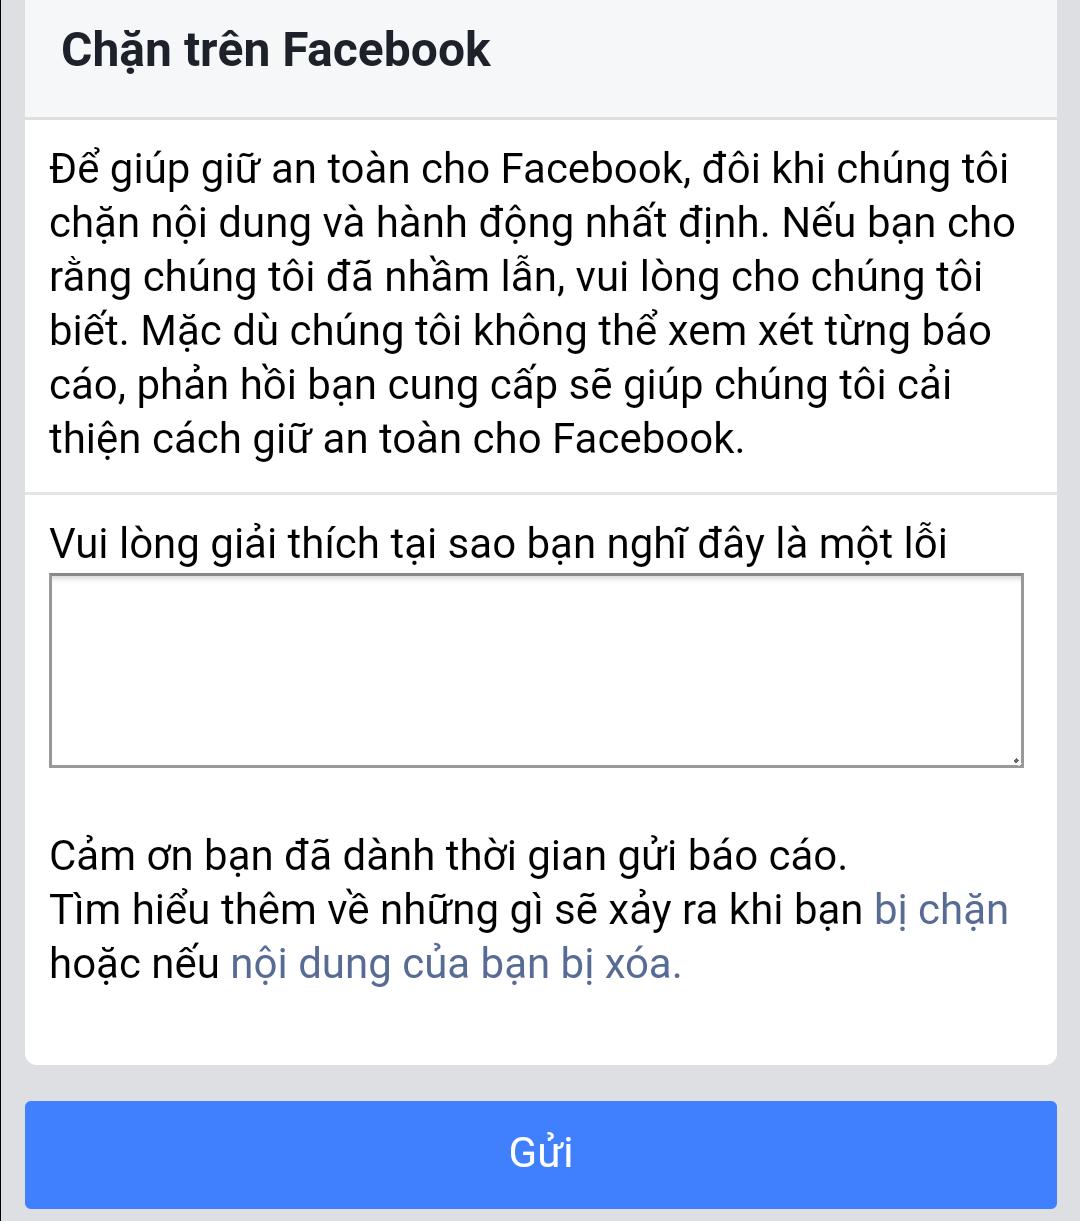 bỏ chặn link web trên facebook